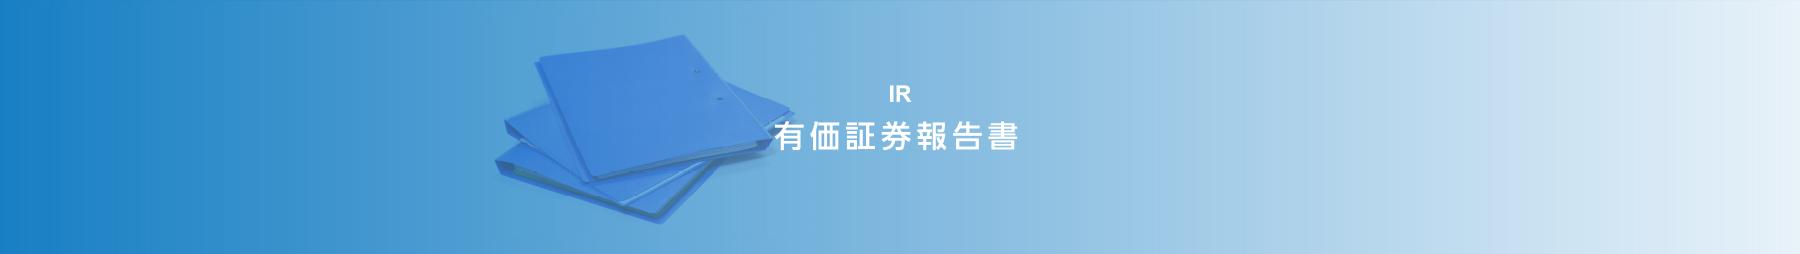 IR 有価証券報告書